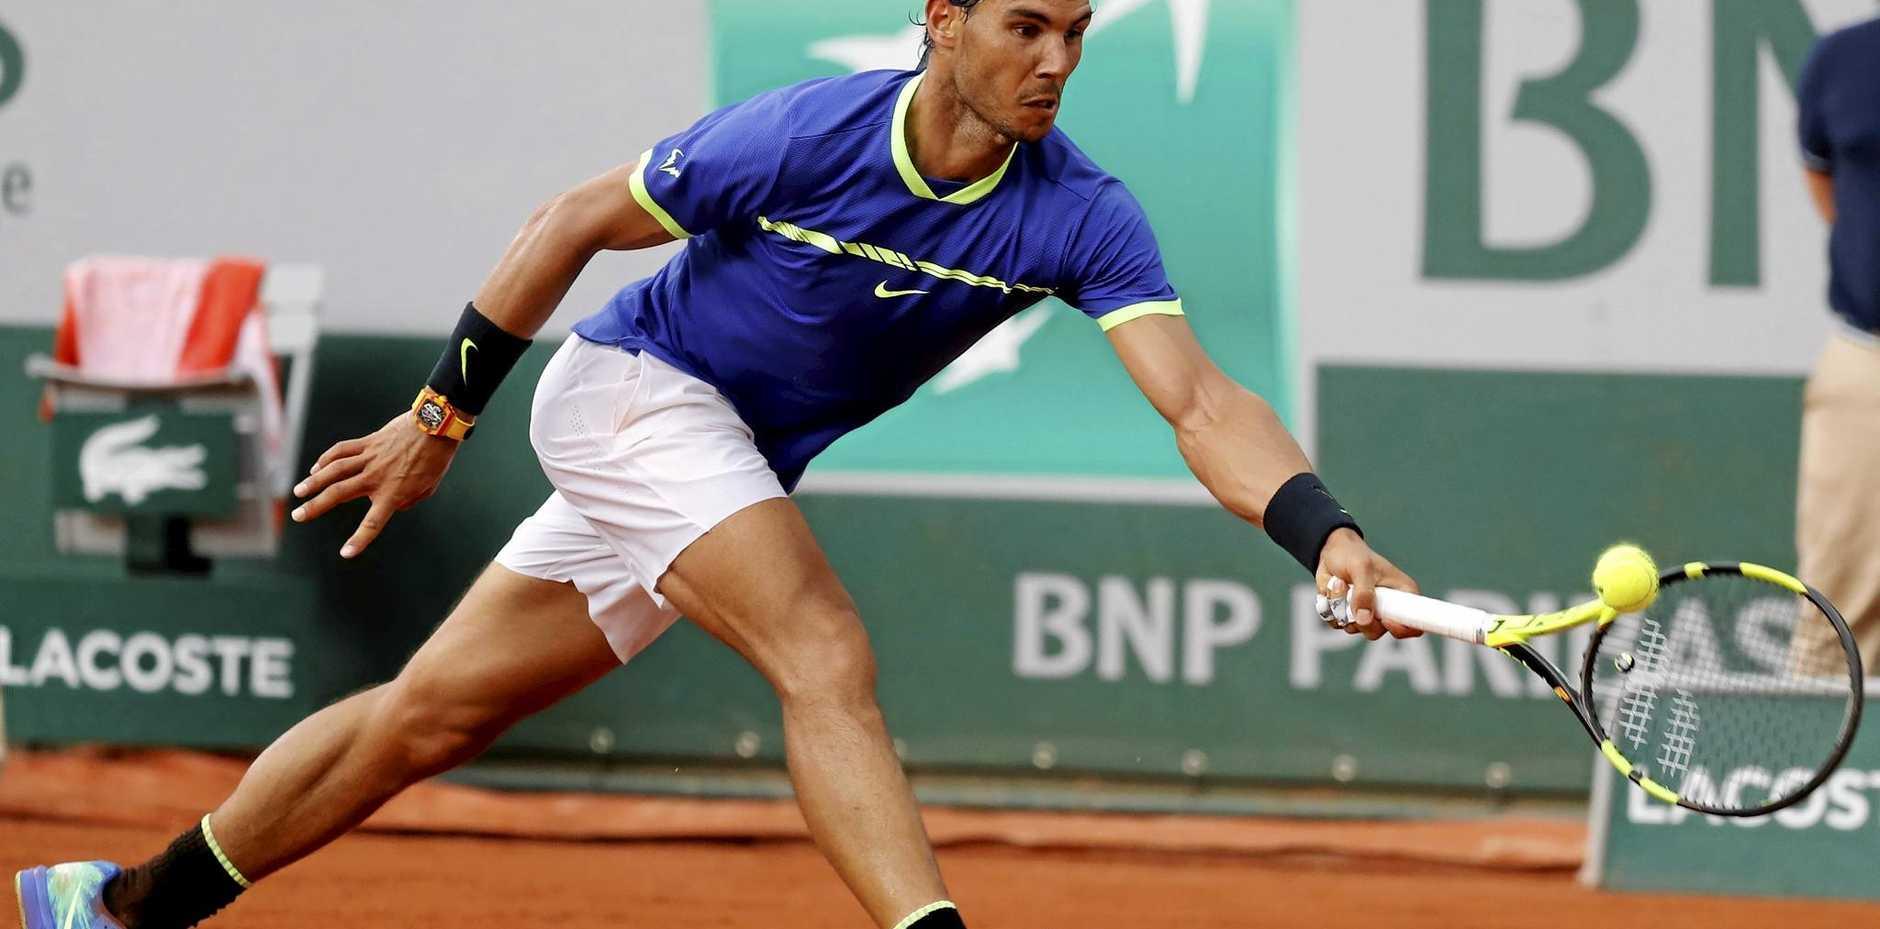 Rafael Nadal of Spain plays against Nikoloz Basilashvili of Georgia during the French Open.